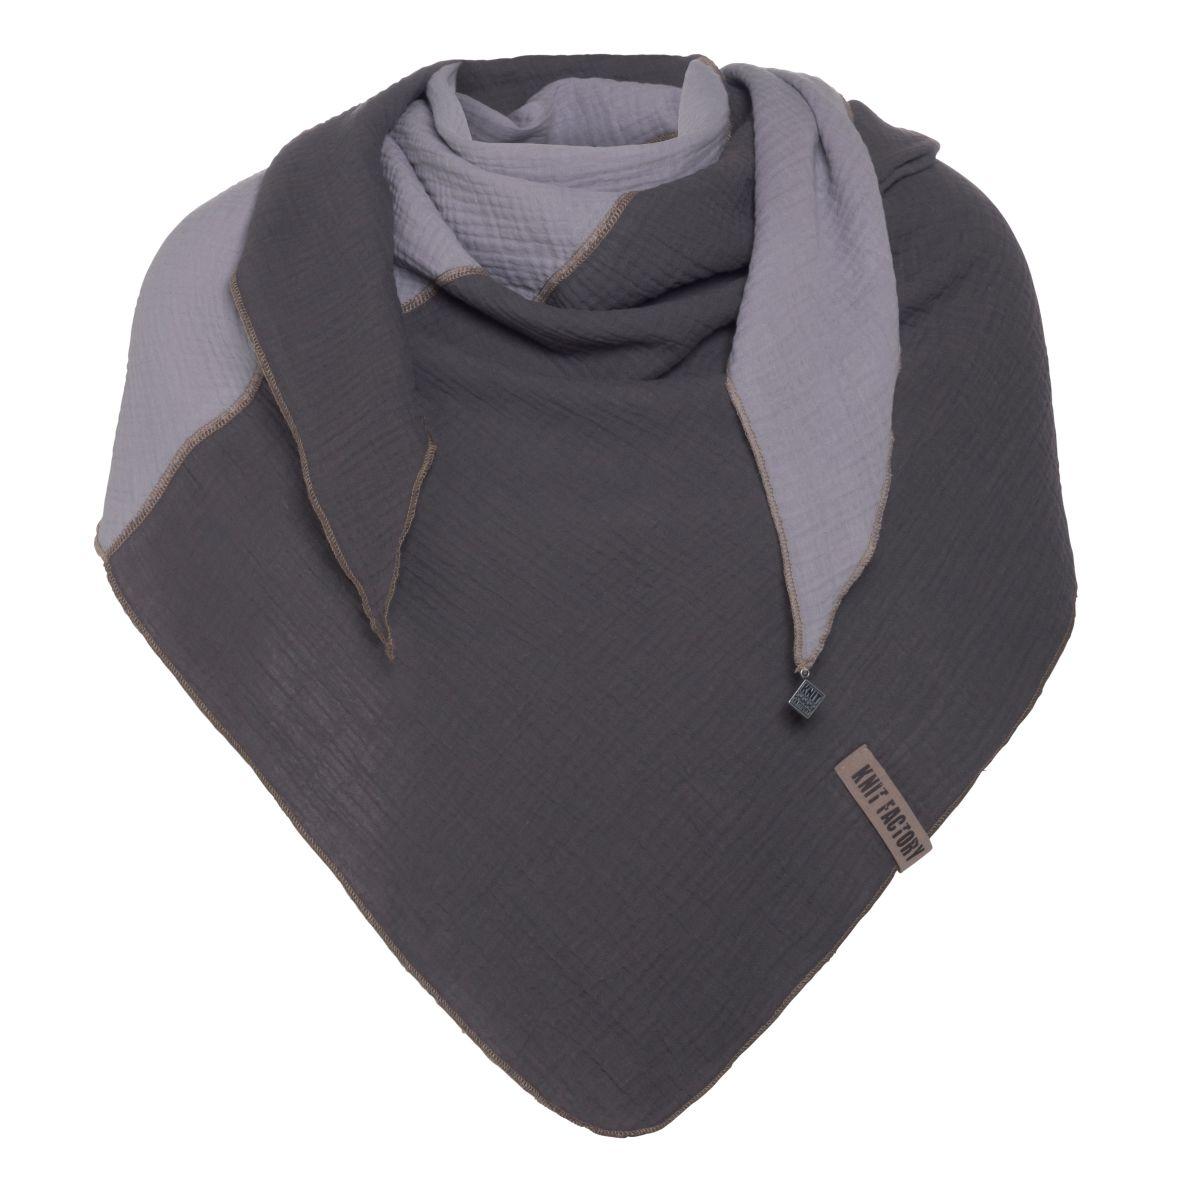 knit factory kf151060050 fay omslagdoek antraciet grijs 1